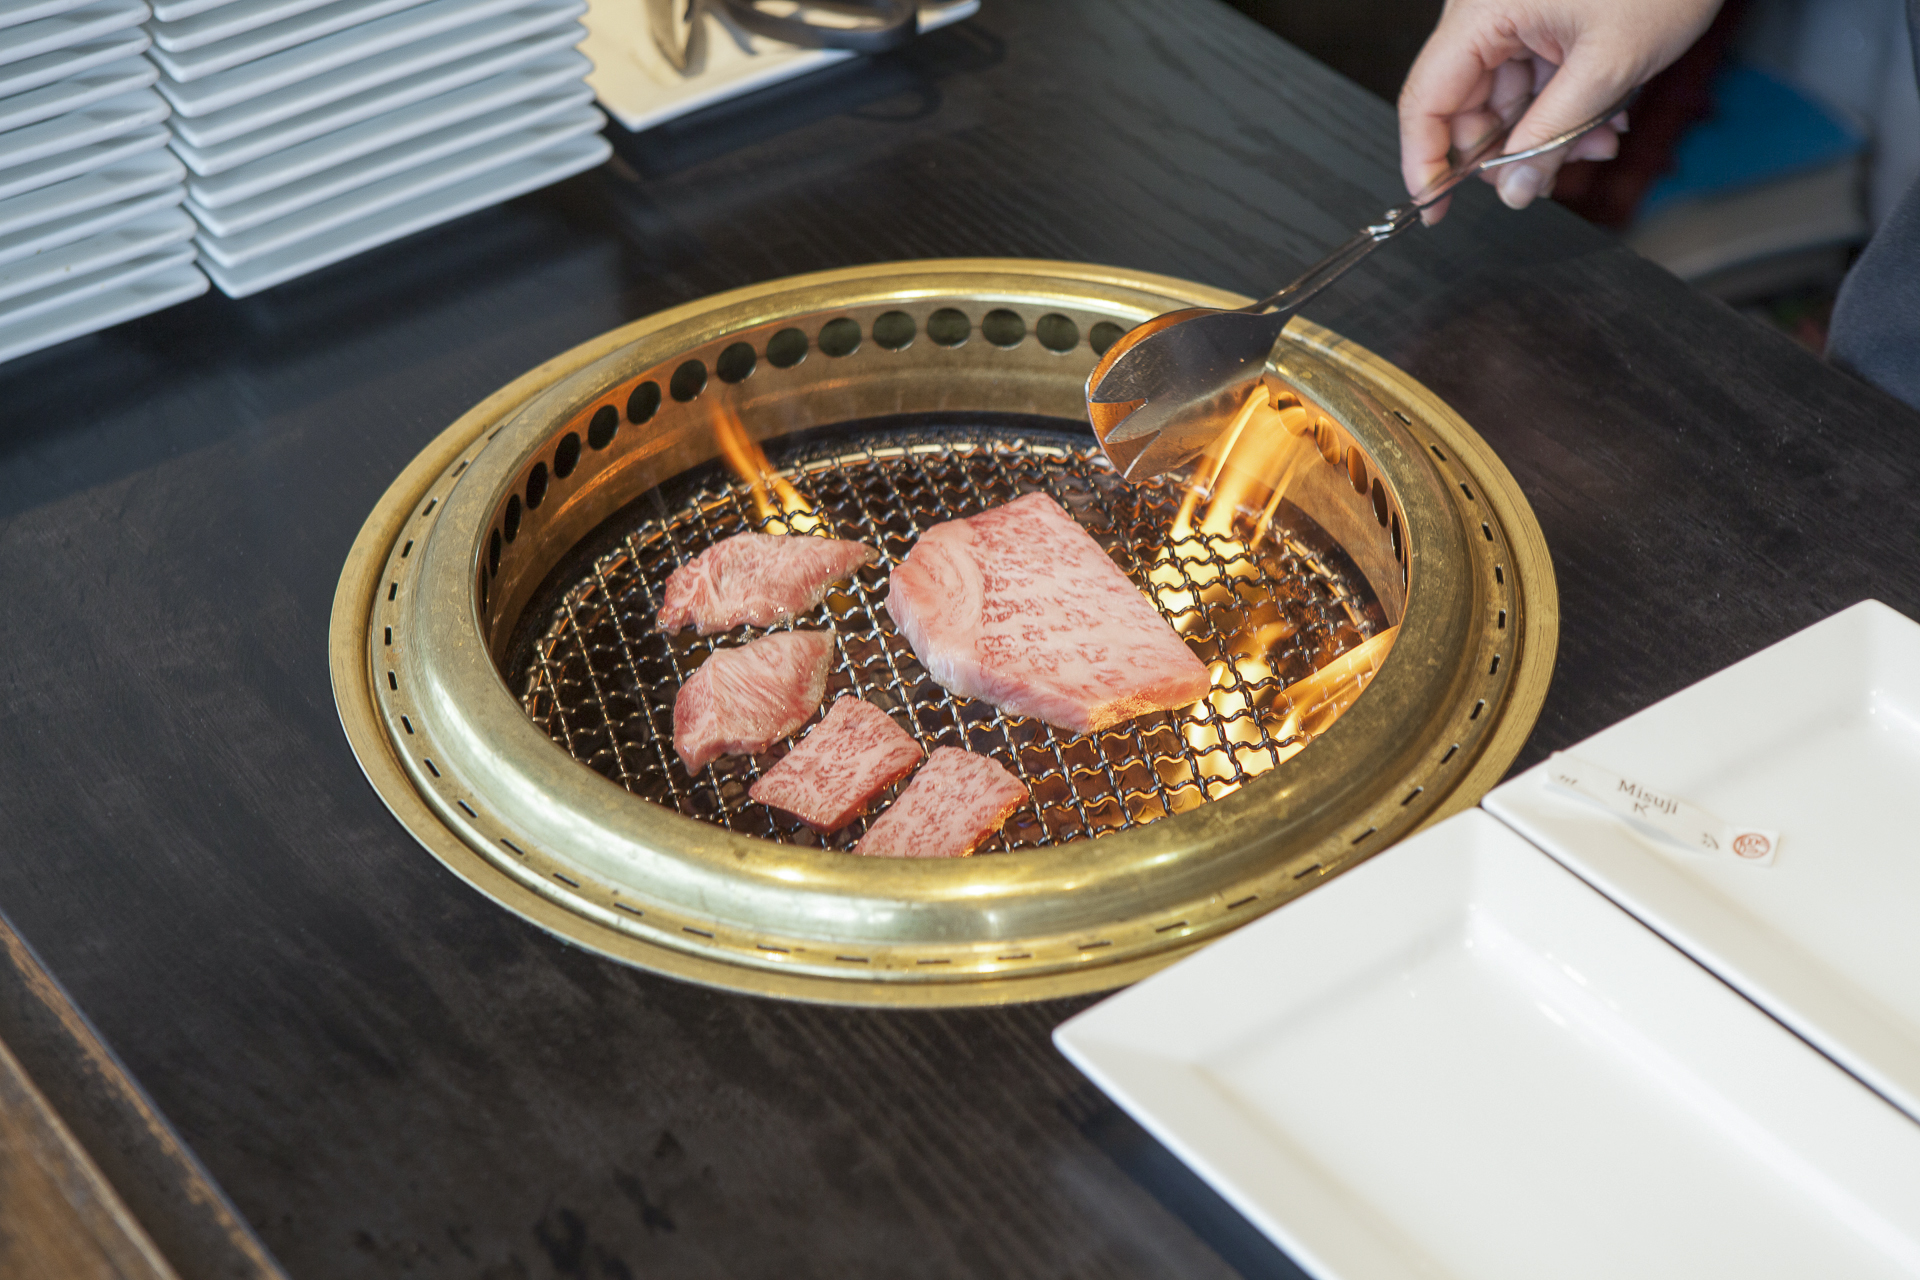 Bild22_Kobe auf dem Grill.jpg